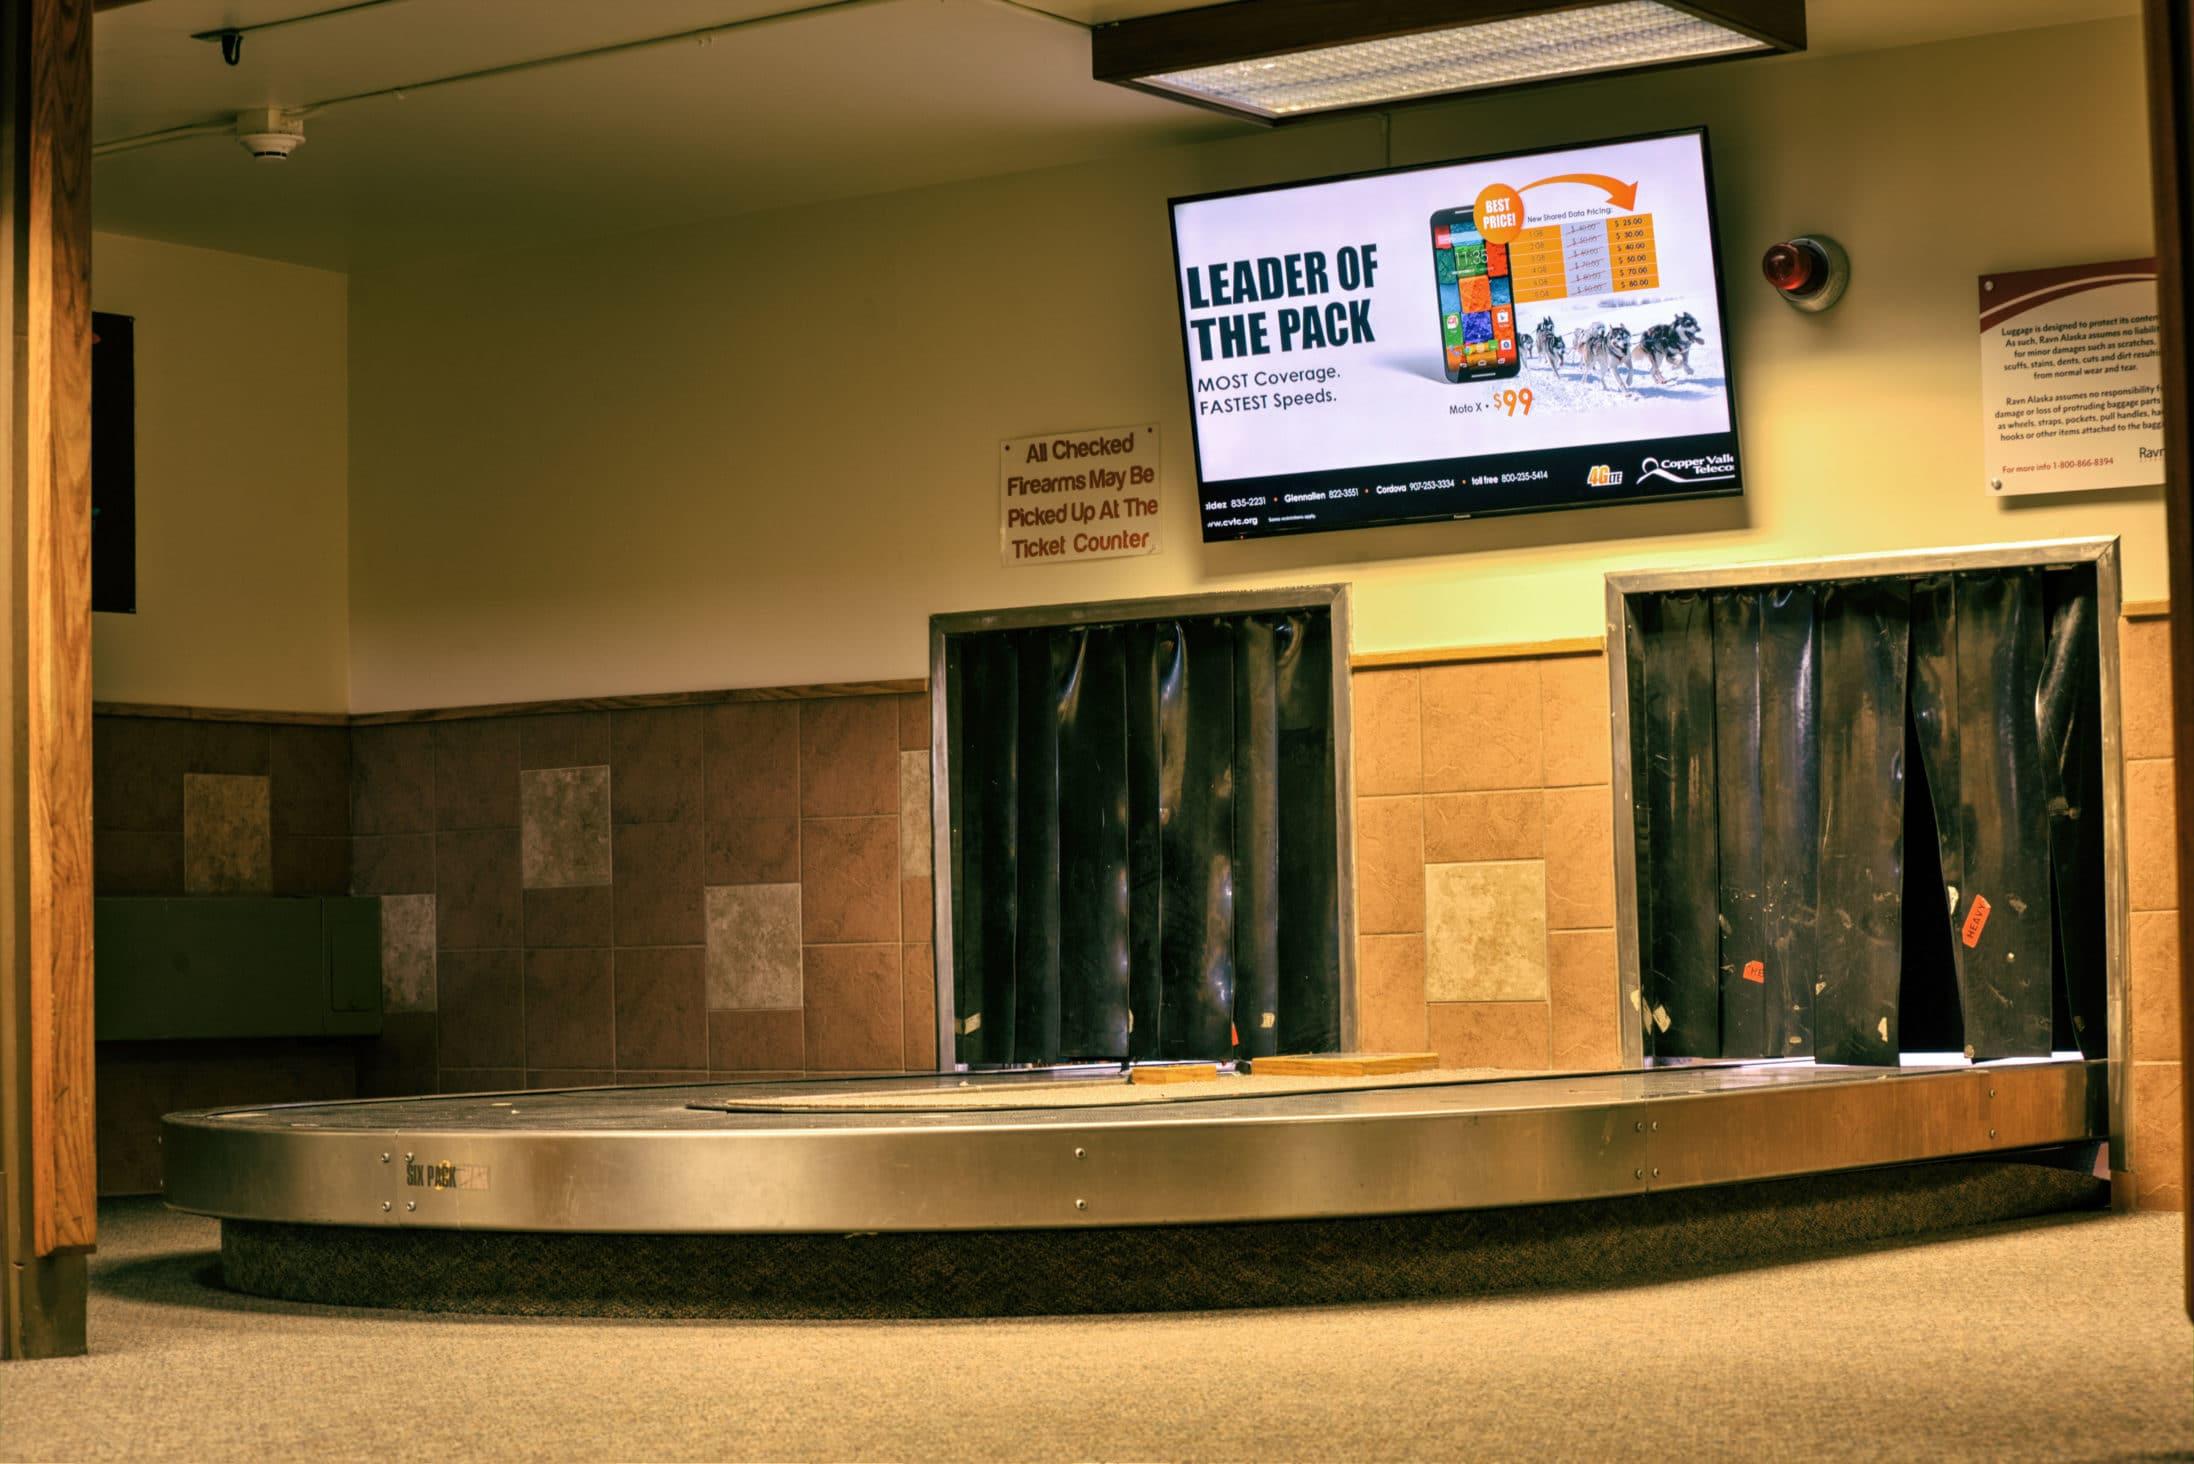 2015-3-31_063_2015-03-31_BTS_Airport-AdvertisingAnd4more_tonemapped-Edit